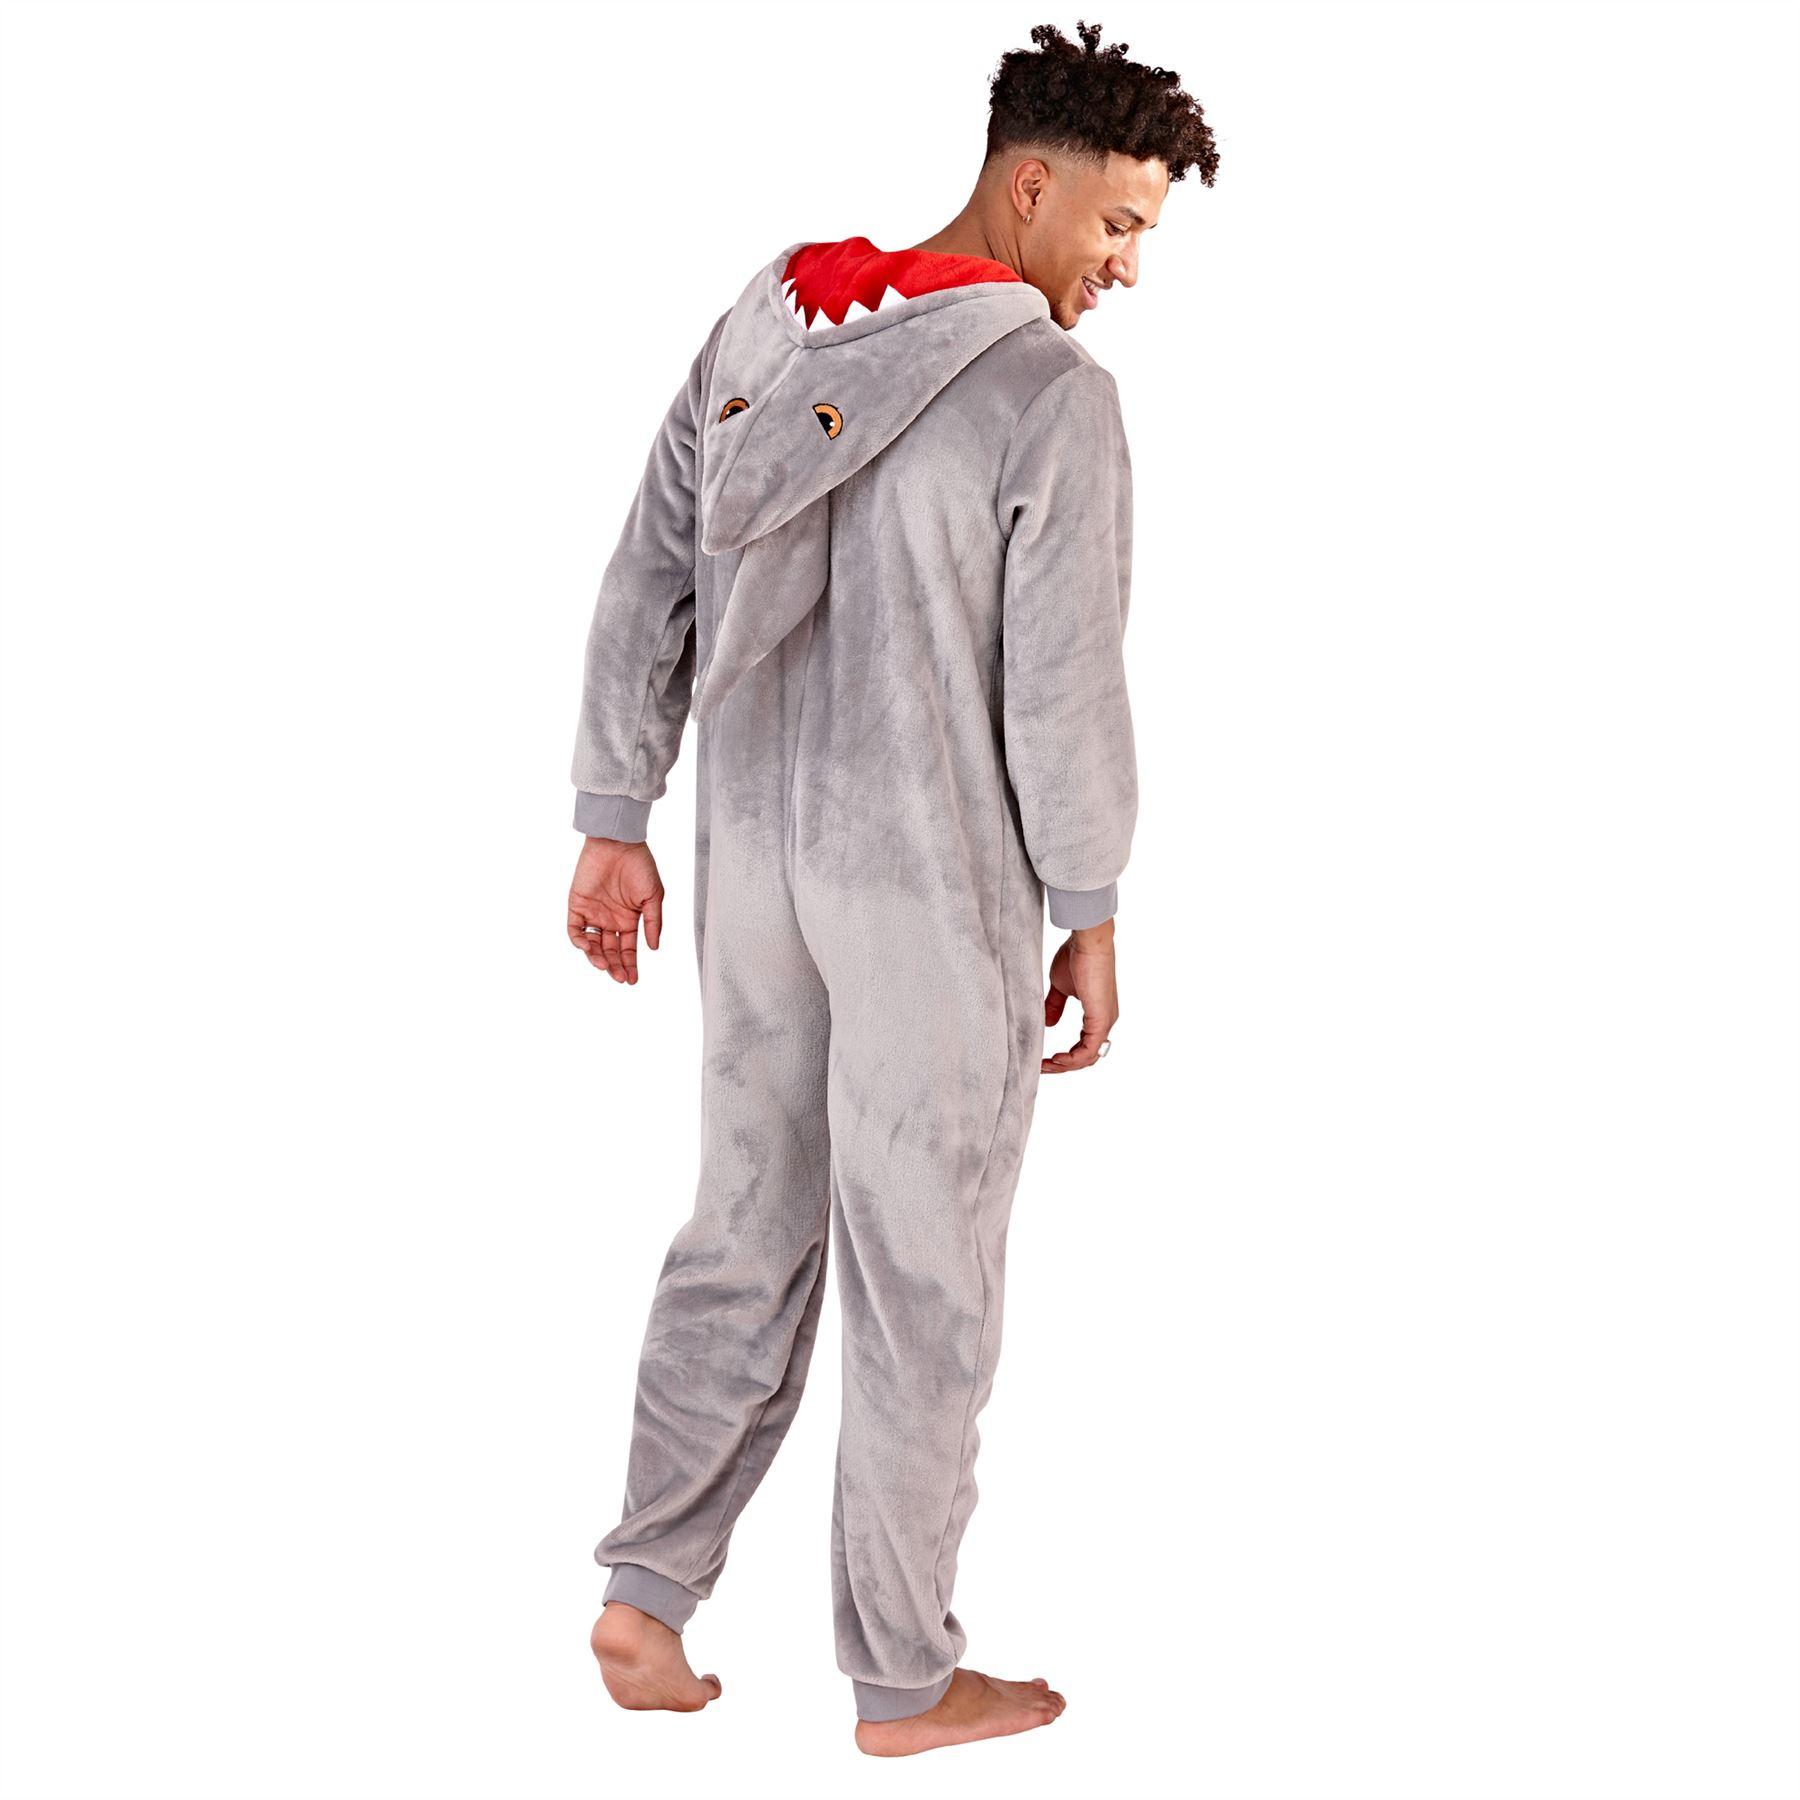 Mens Rhino Onesies All in One Boys Novelty Dress Up Hooded Fleece Zip Jumpsuit Sleepsuit